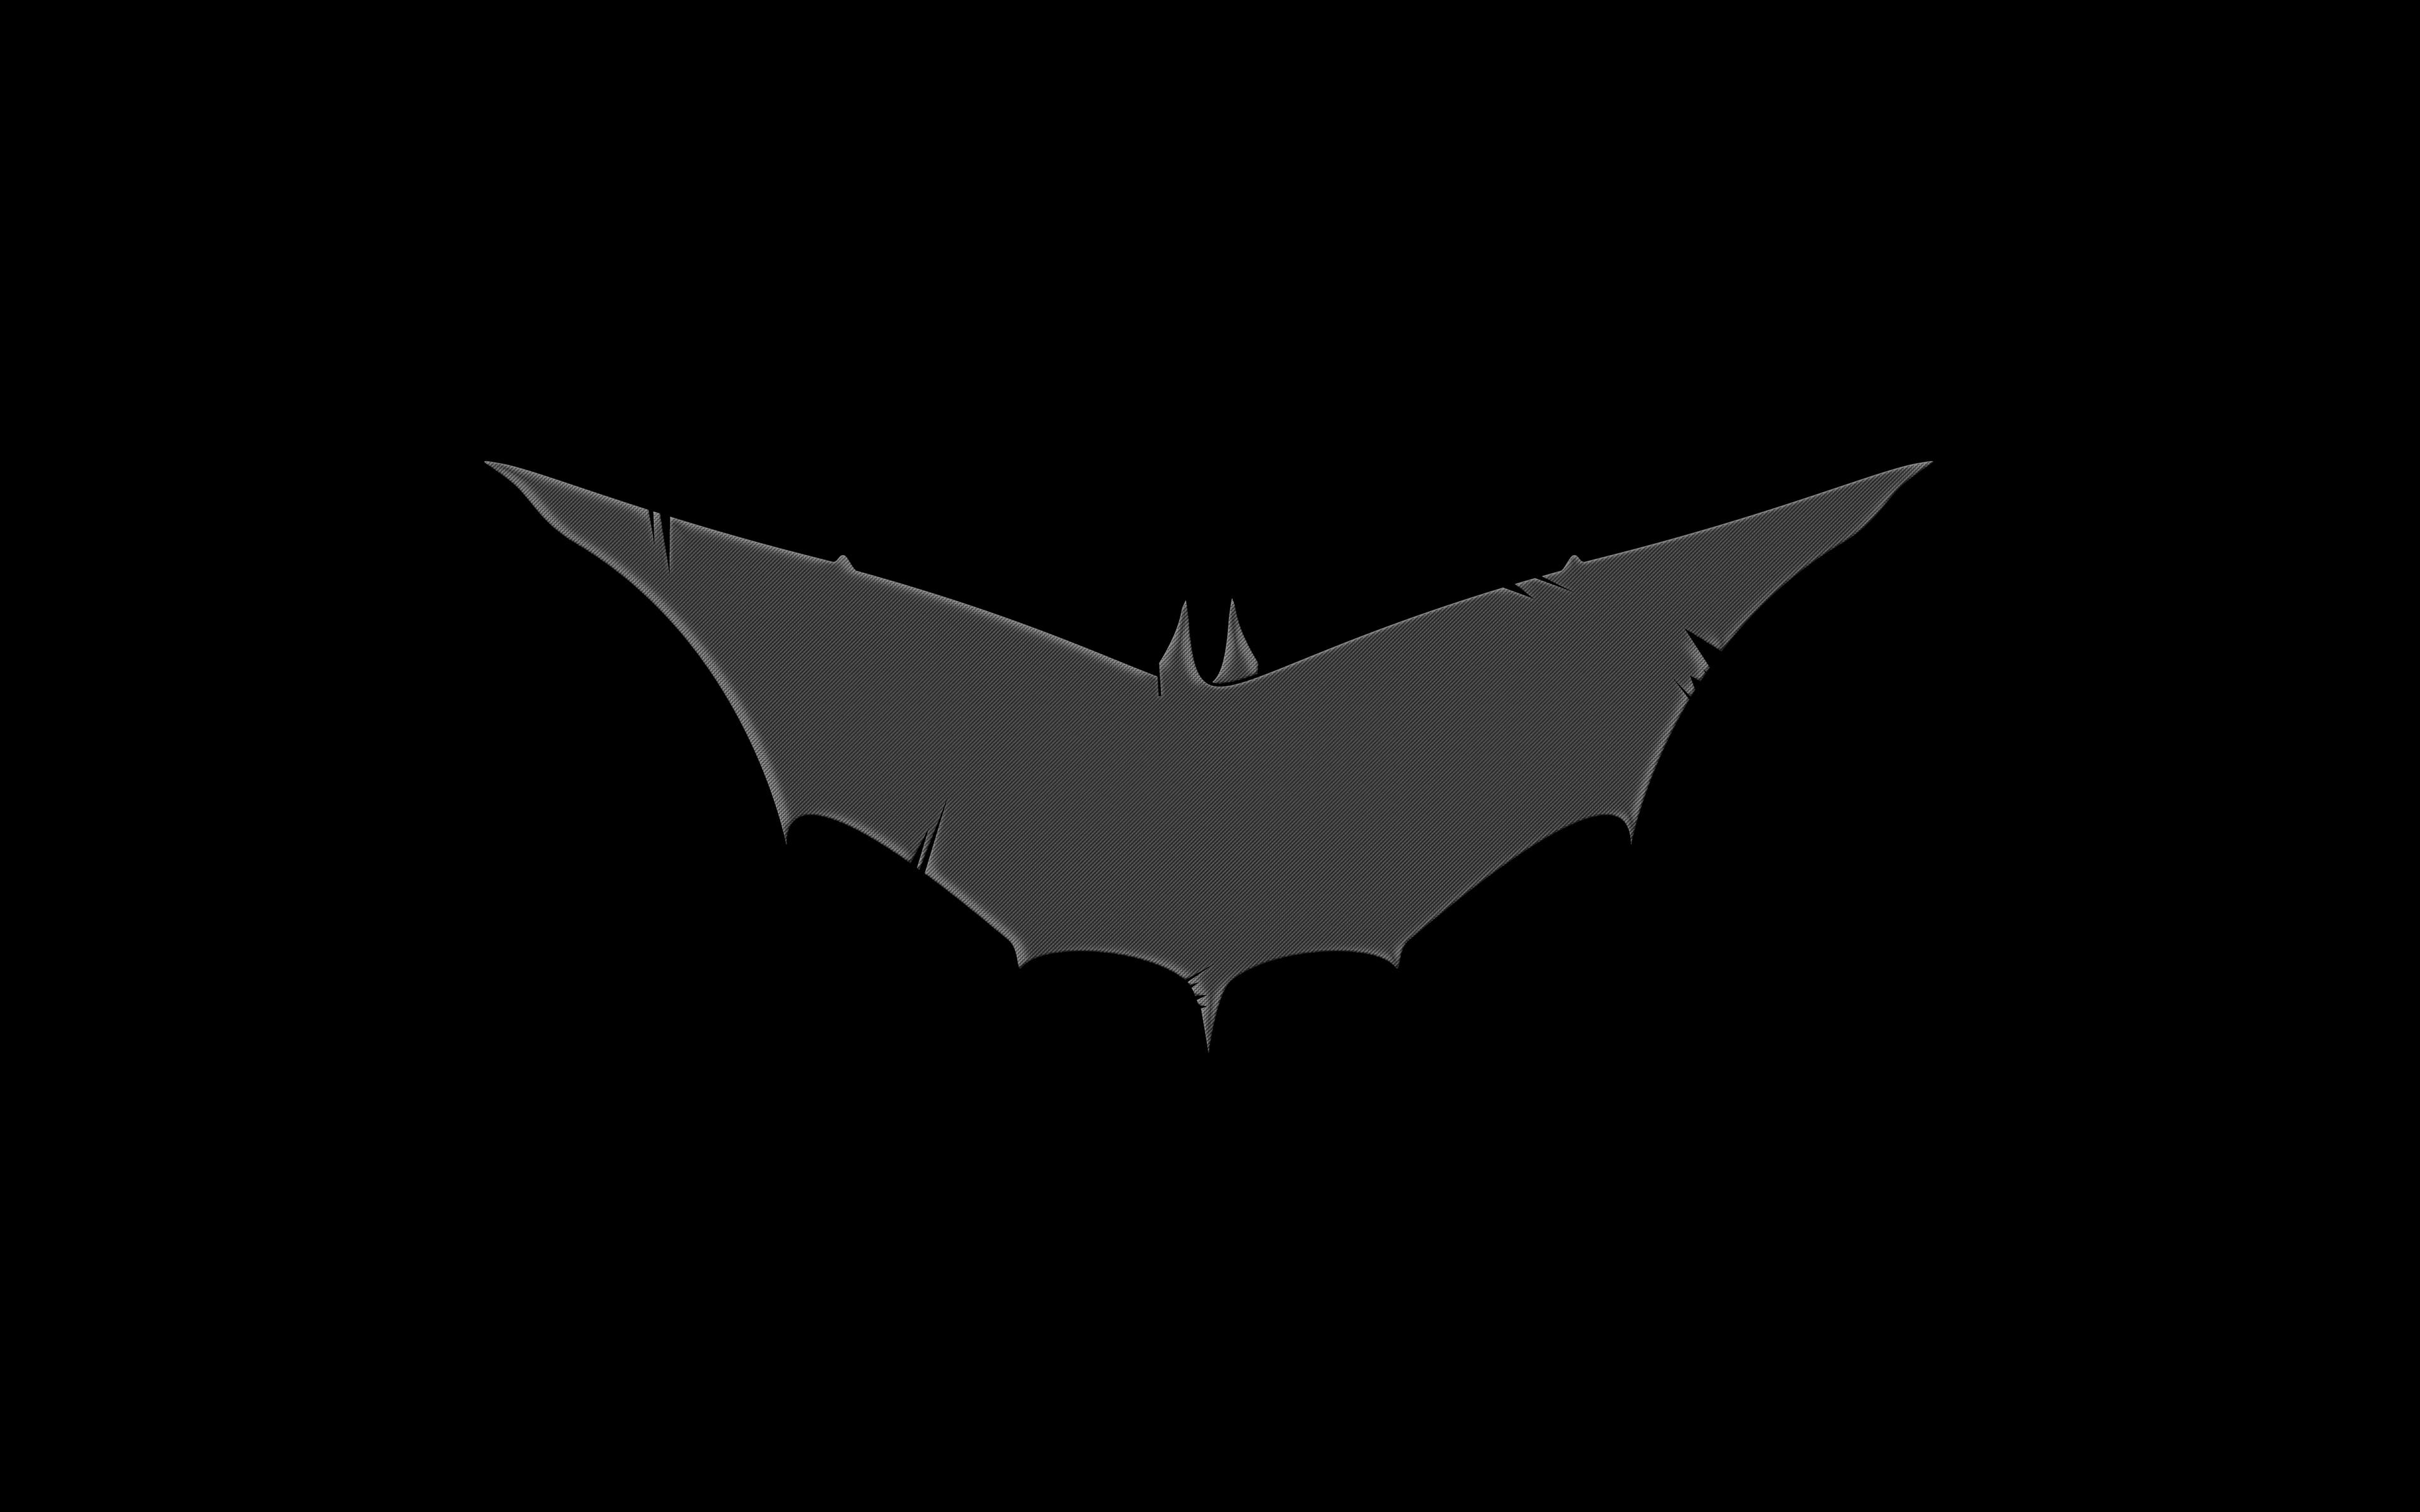 batman-grey-logo-8k-zb.jpg